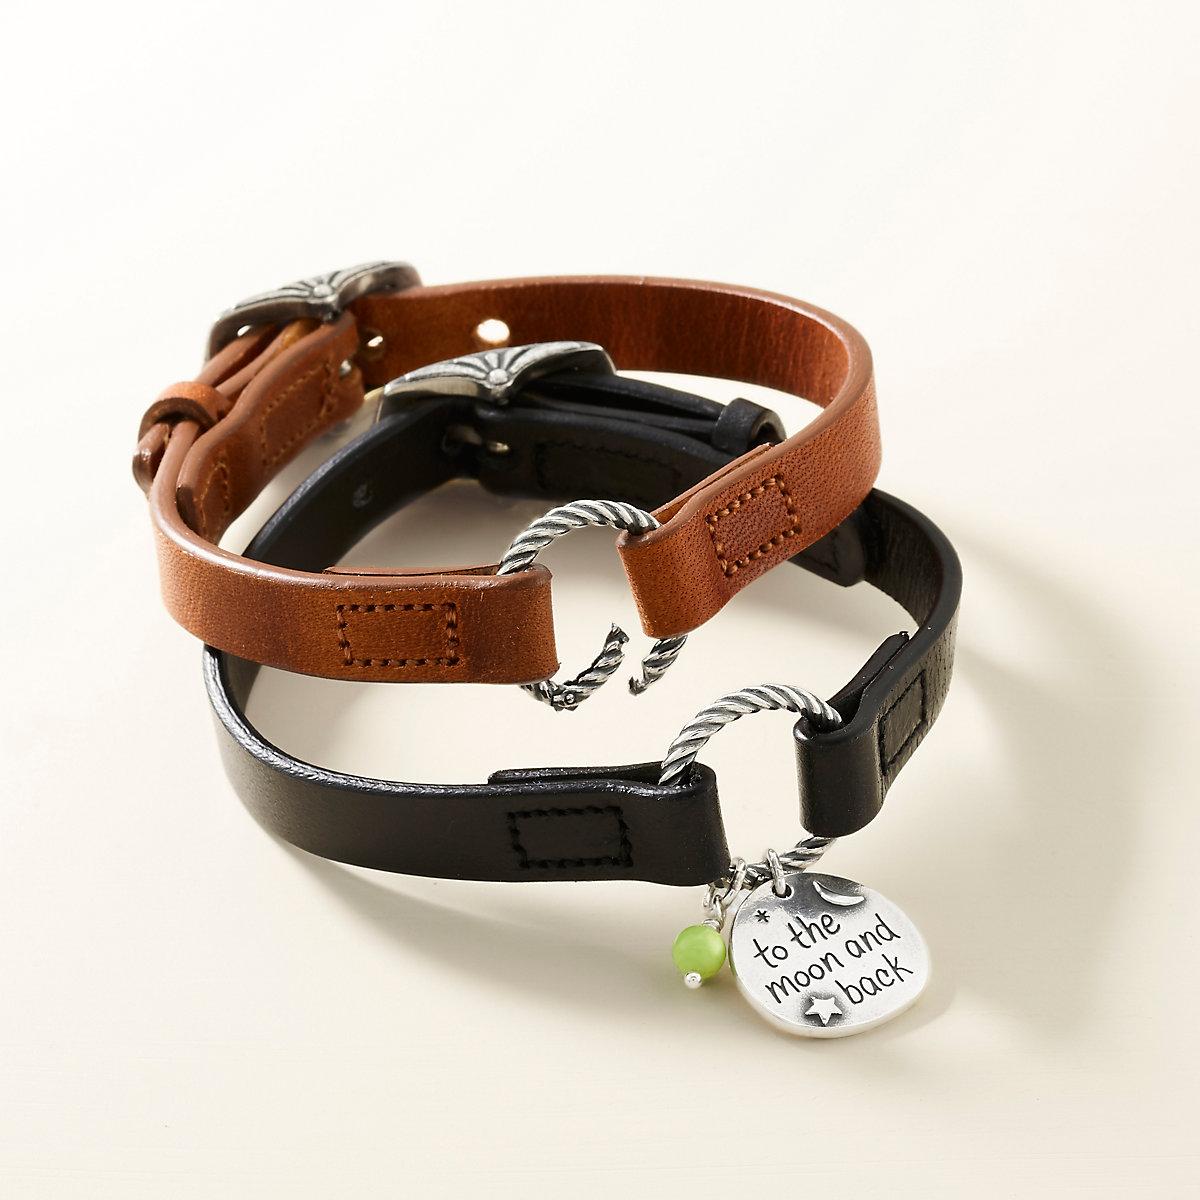 Changeable Leather Charm Bracelet